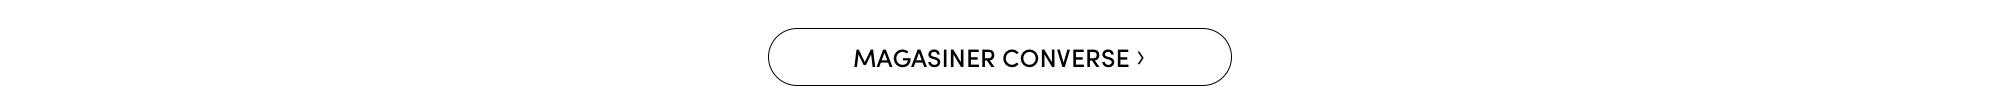 Magasiner Converse